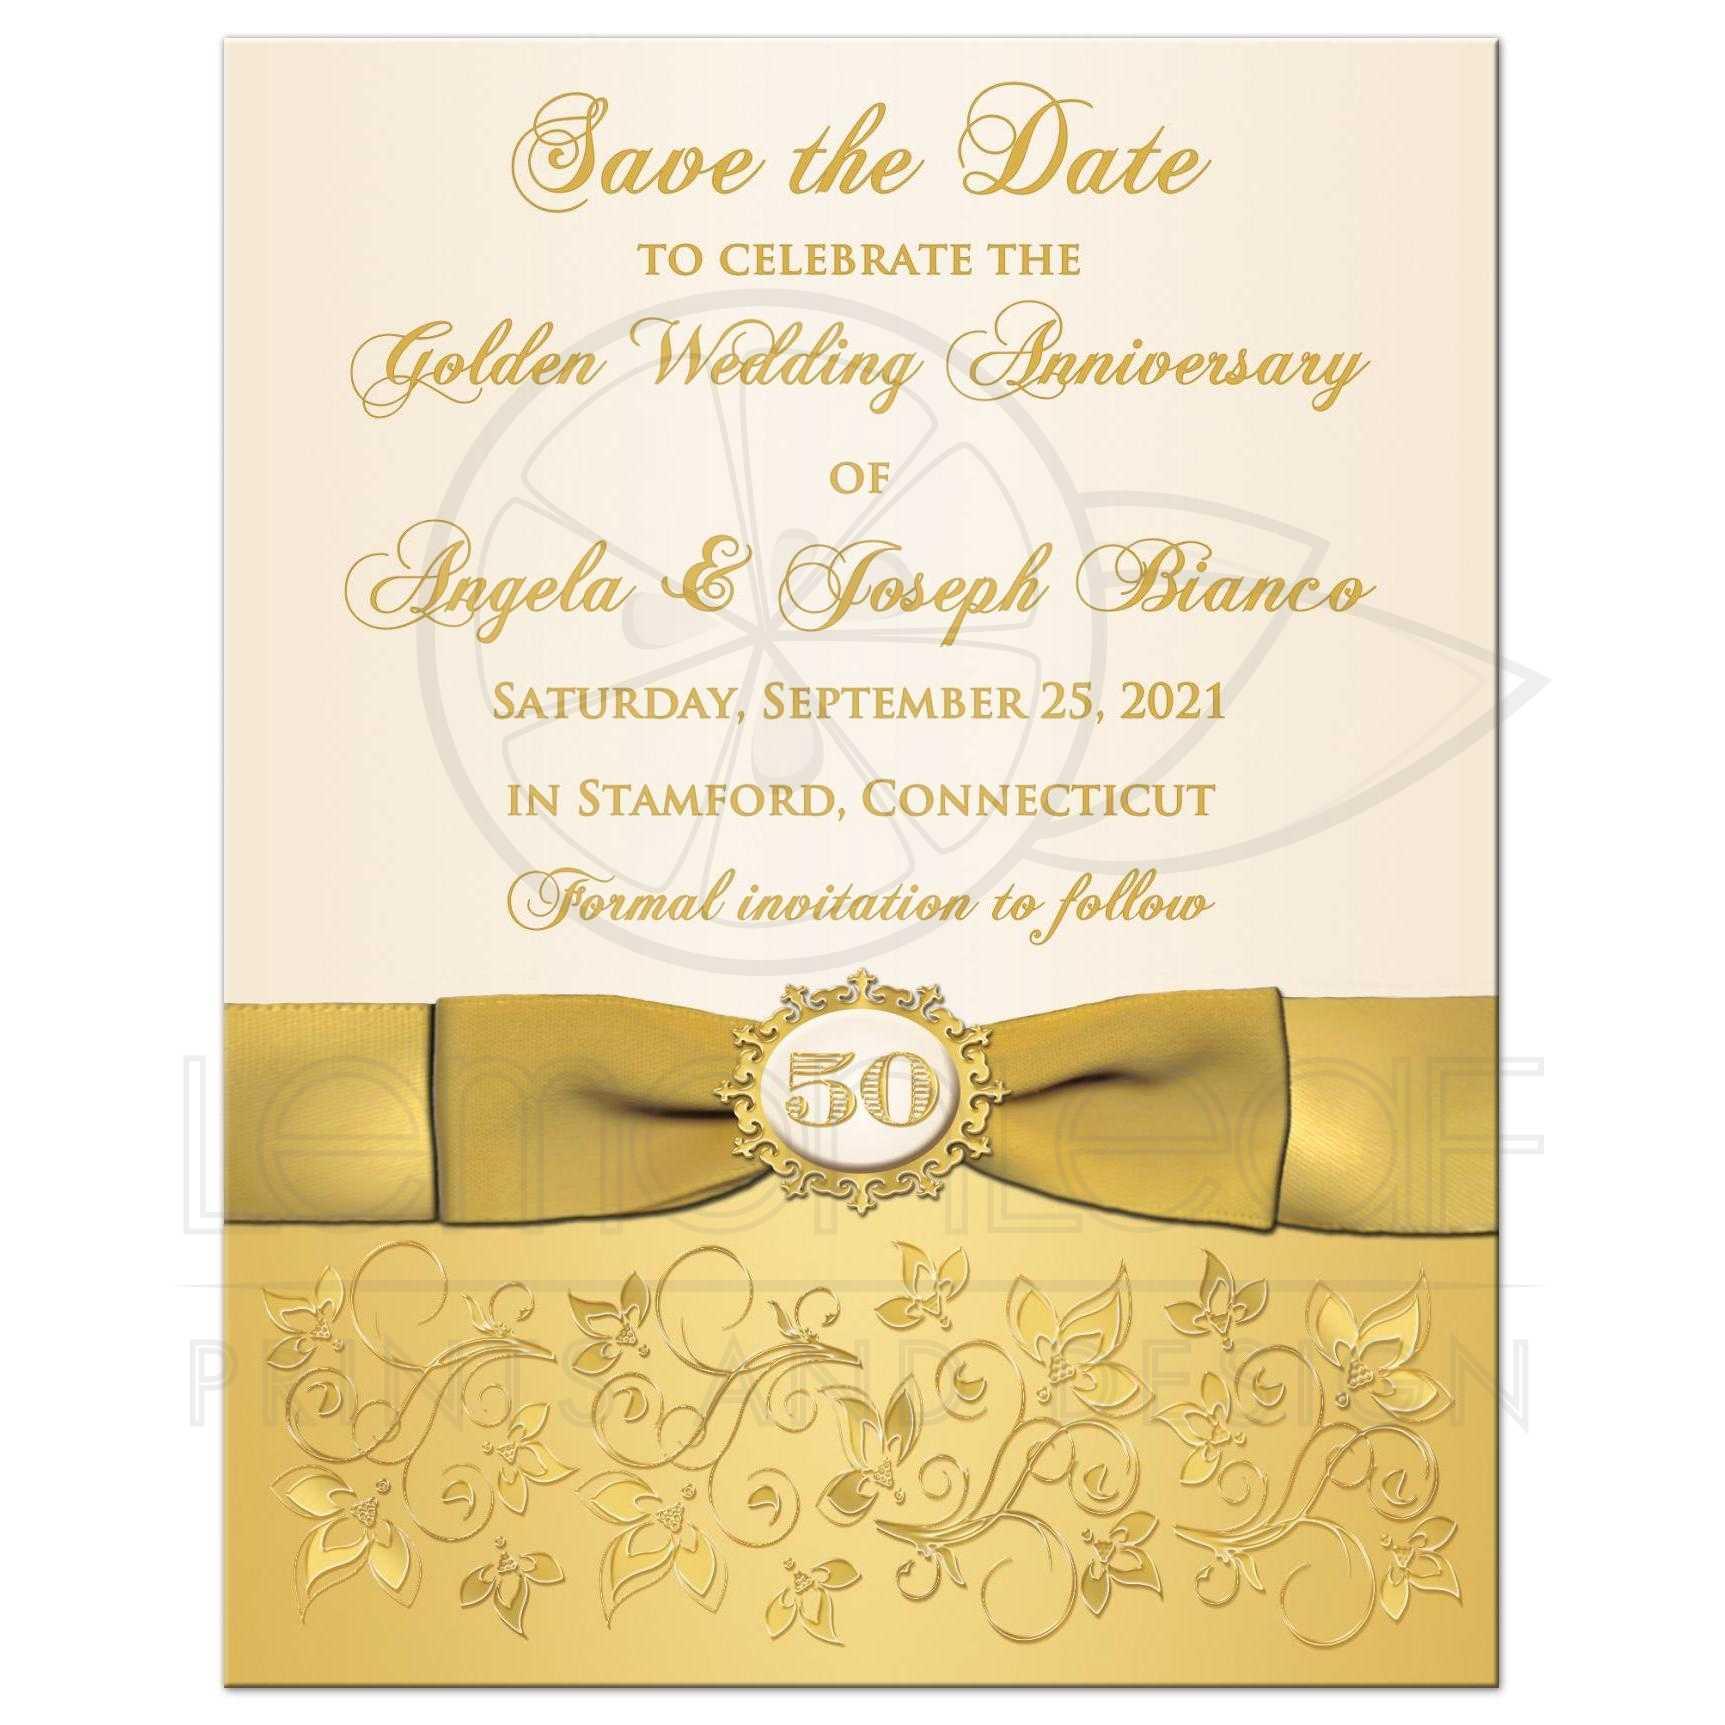 Flowers For Golden Wedding Anniversary: Ivory, Gold Floral Golden Wedding Anniversary Save The